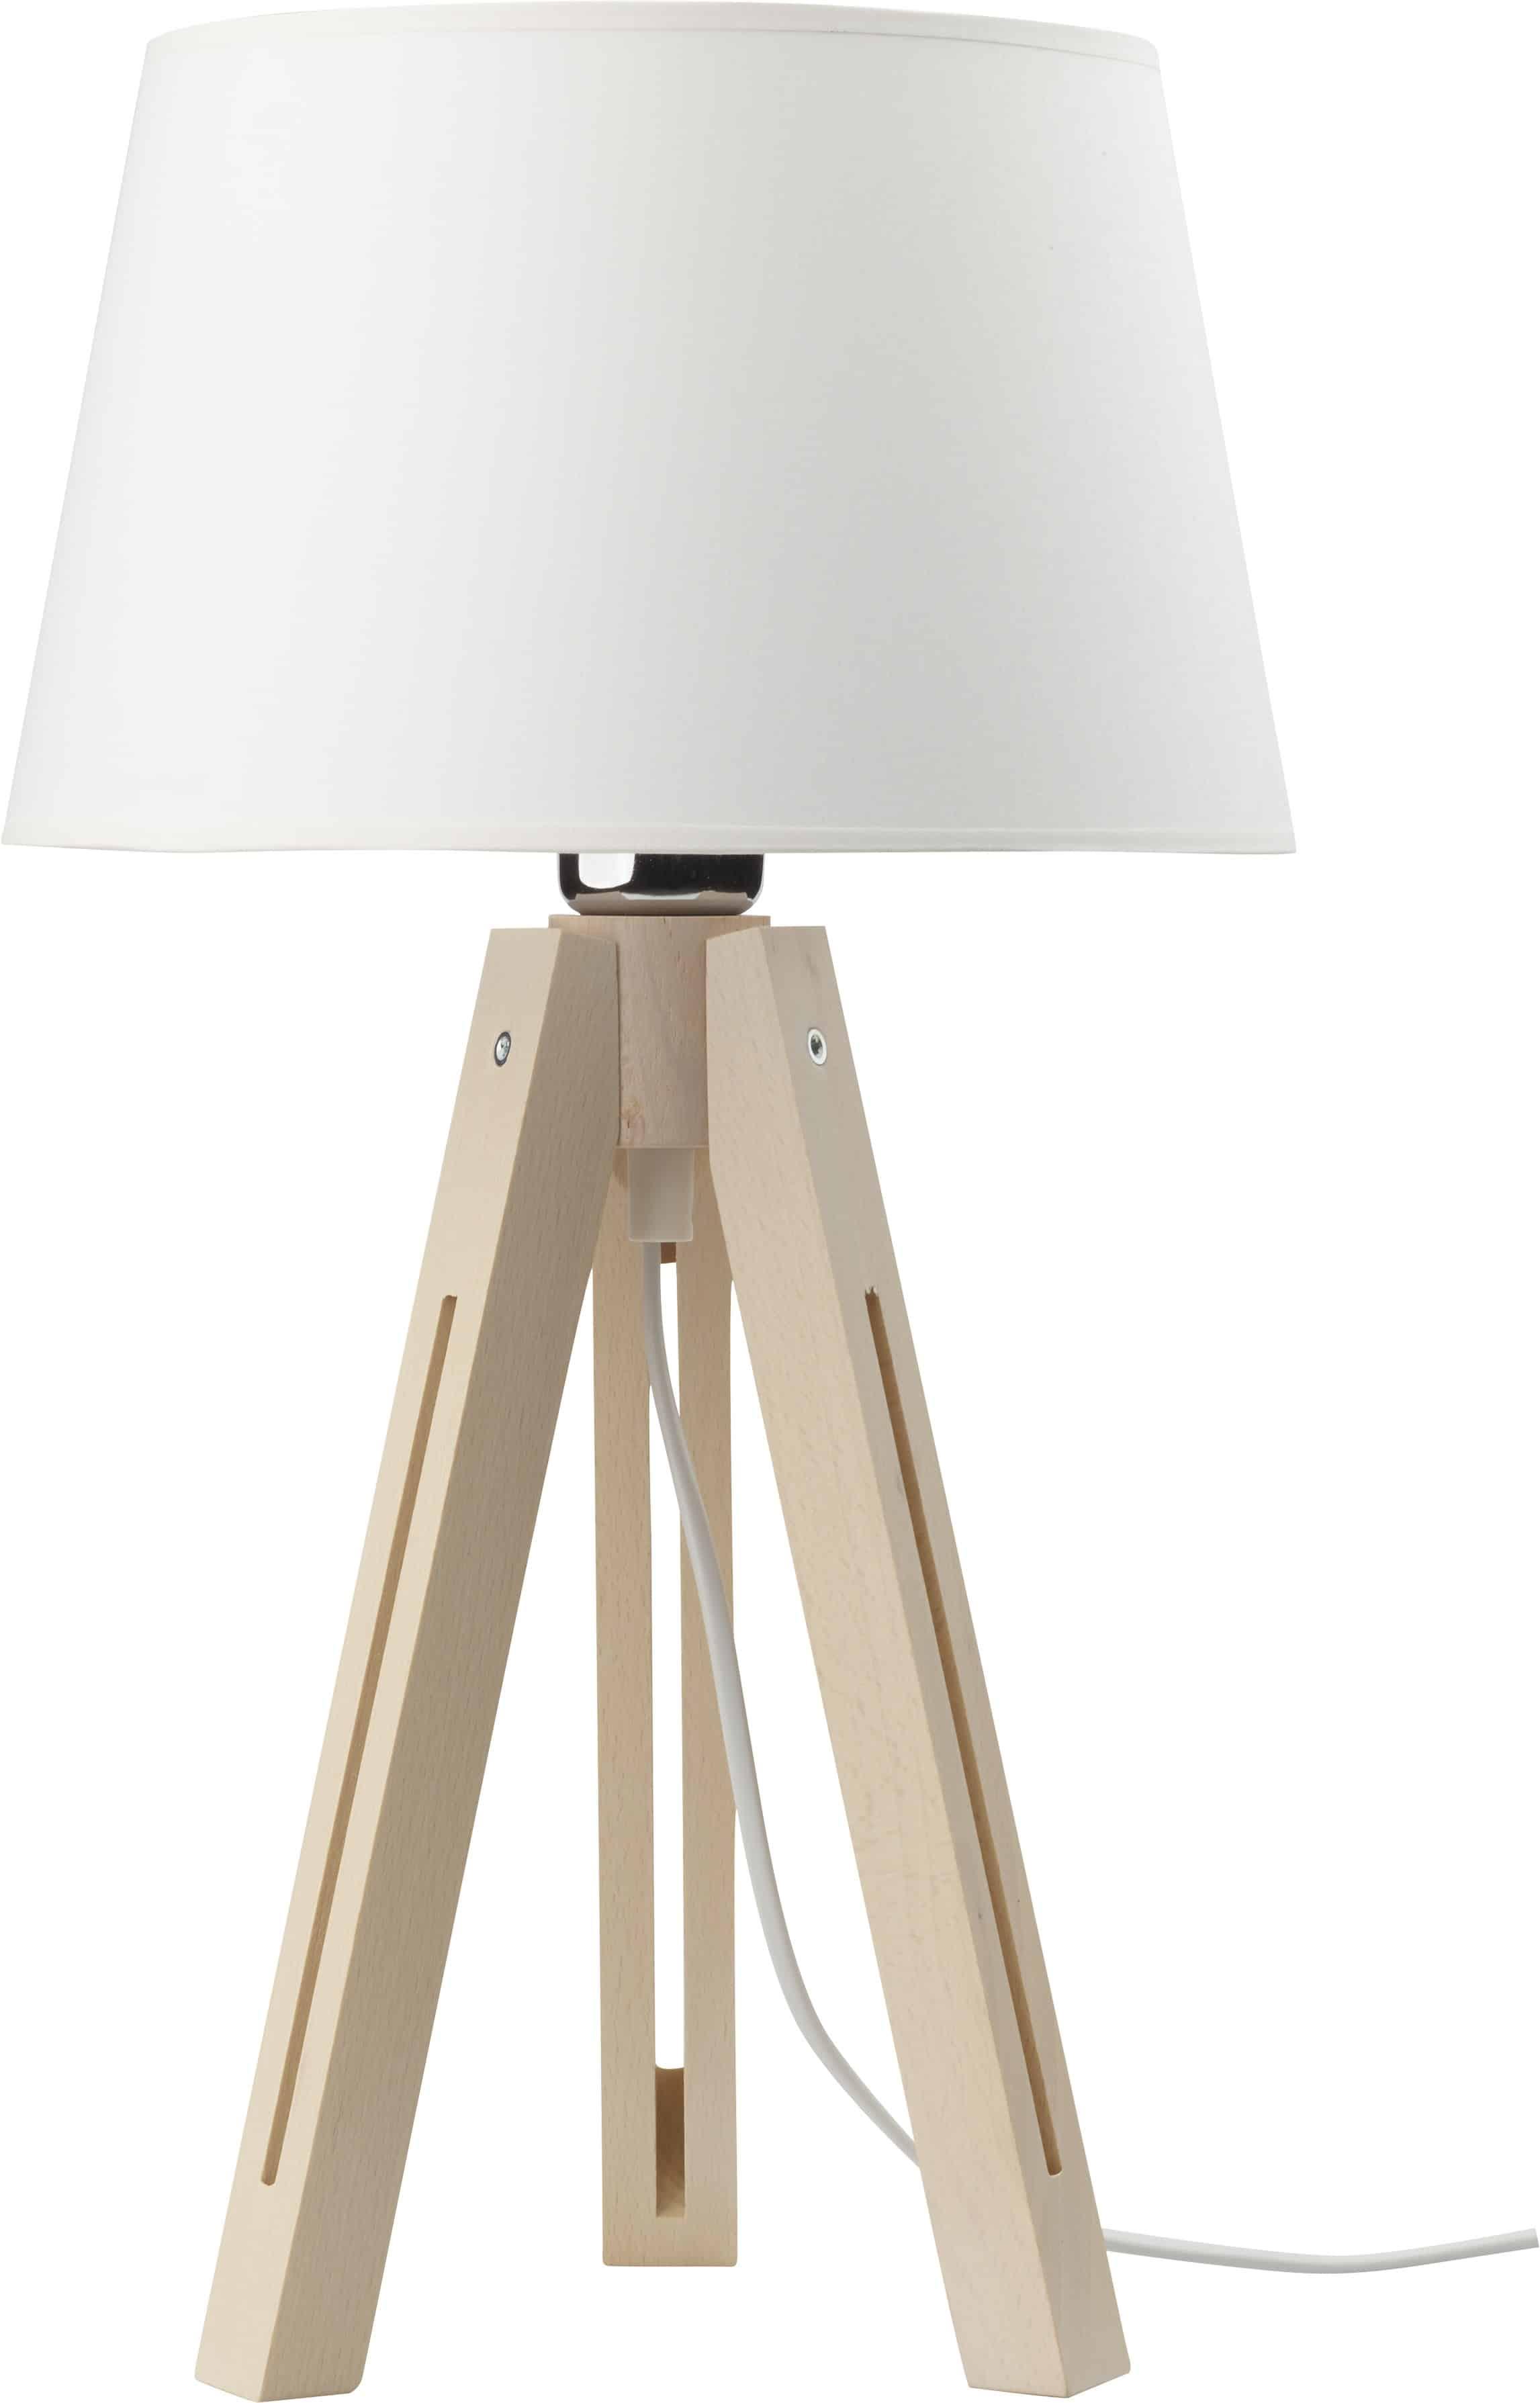 Lampa Stołowa Lorenzo 2975 Tk Lighting